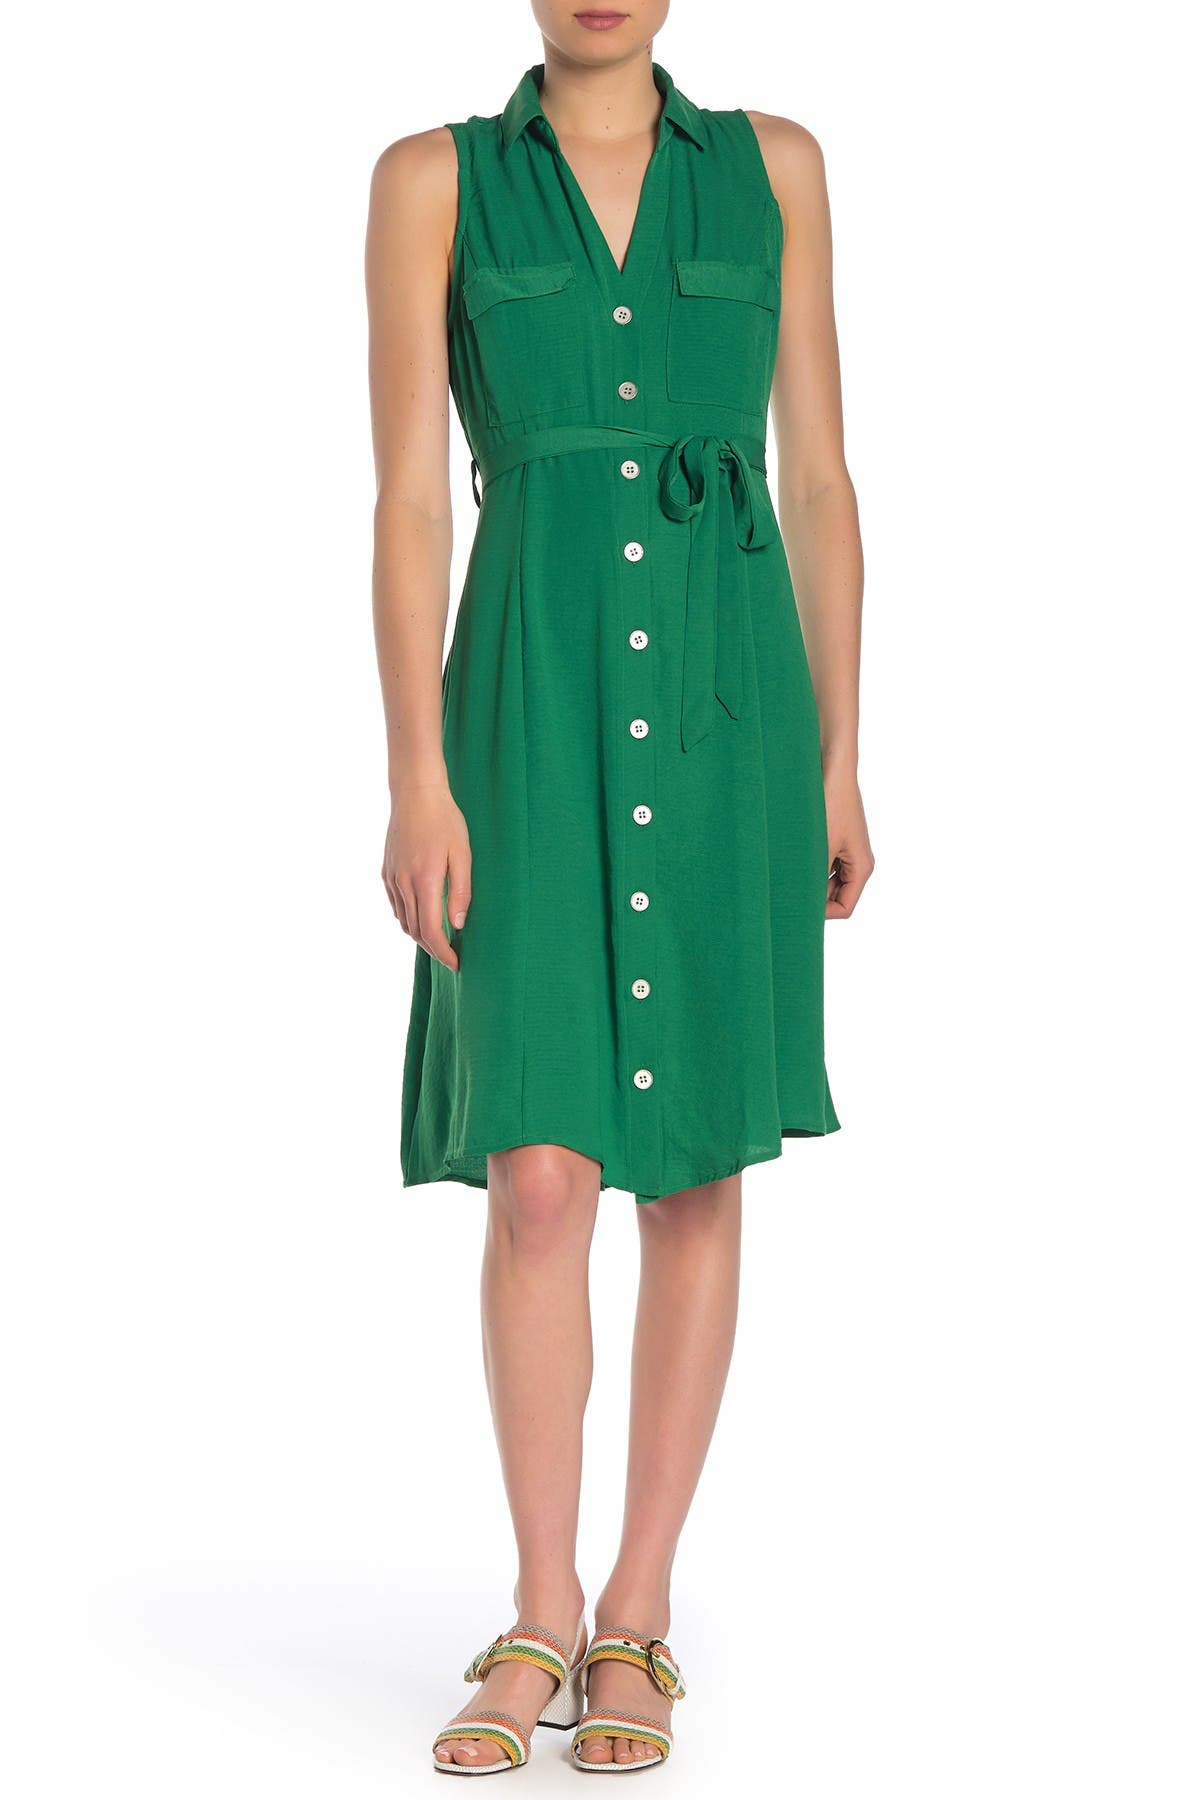 Image of SUPERFOXX Sleeveless Midi Shirt Dress